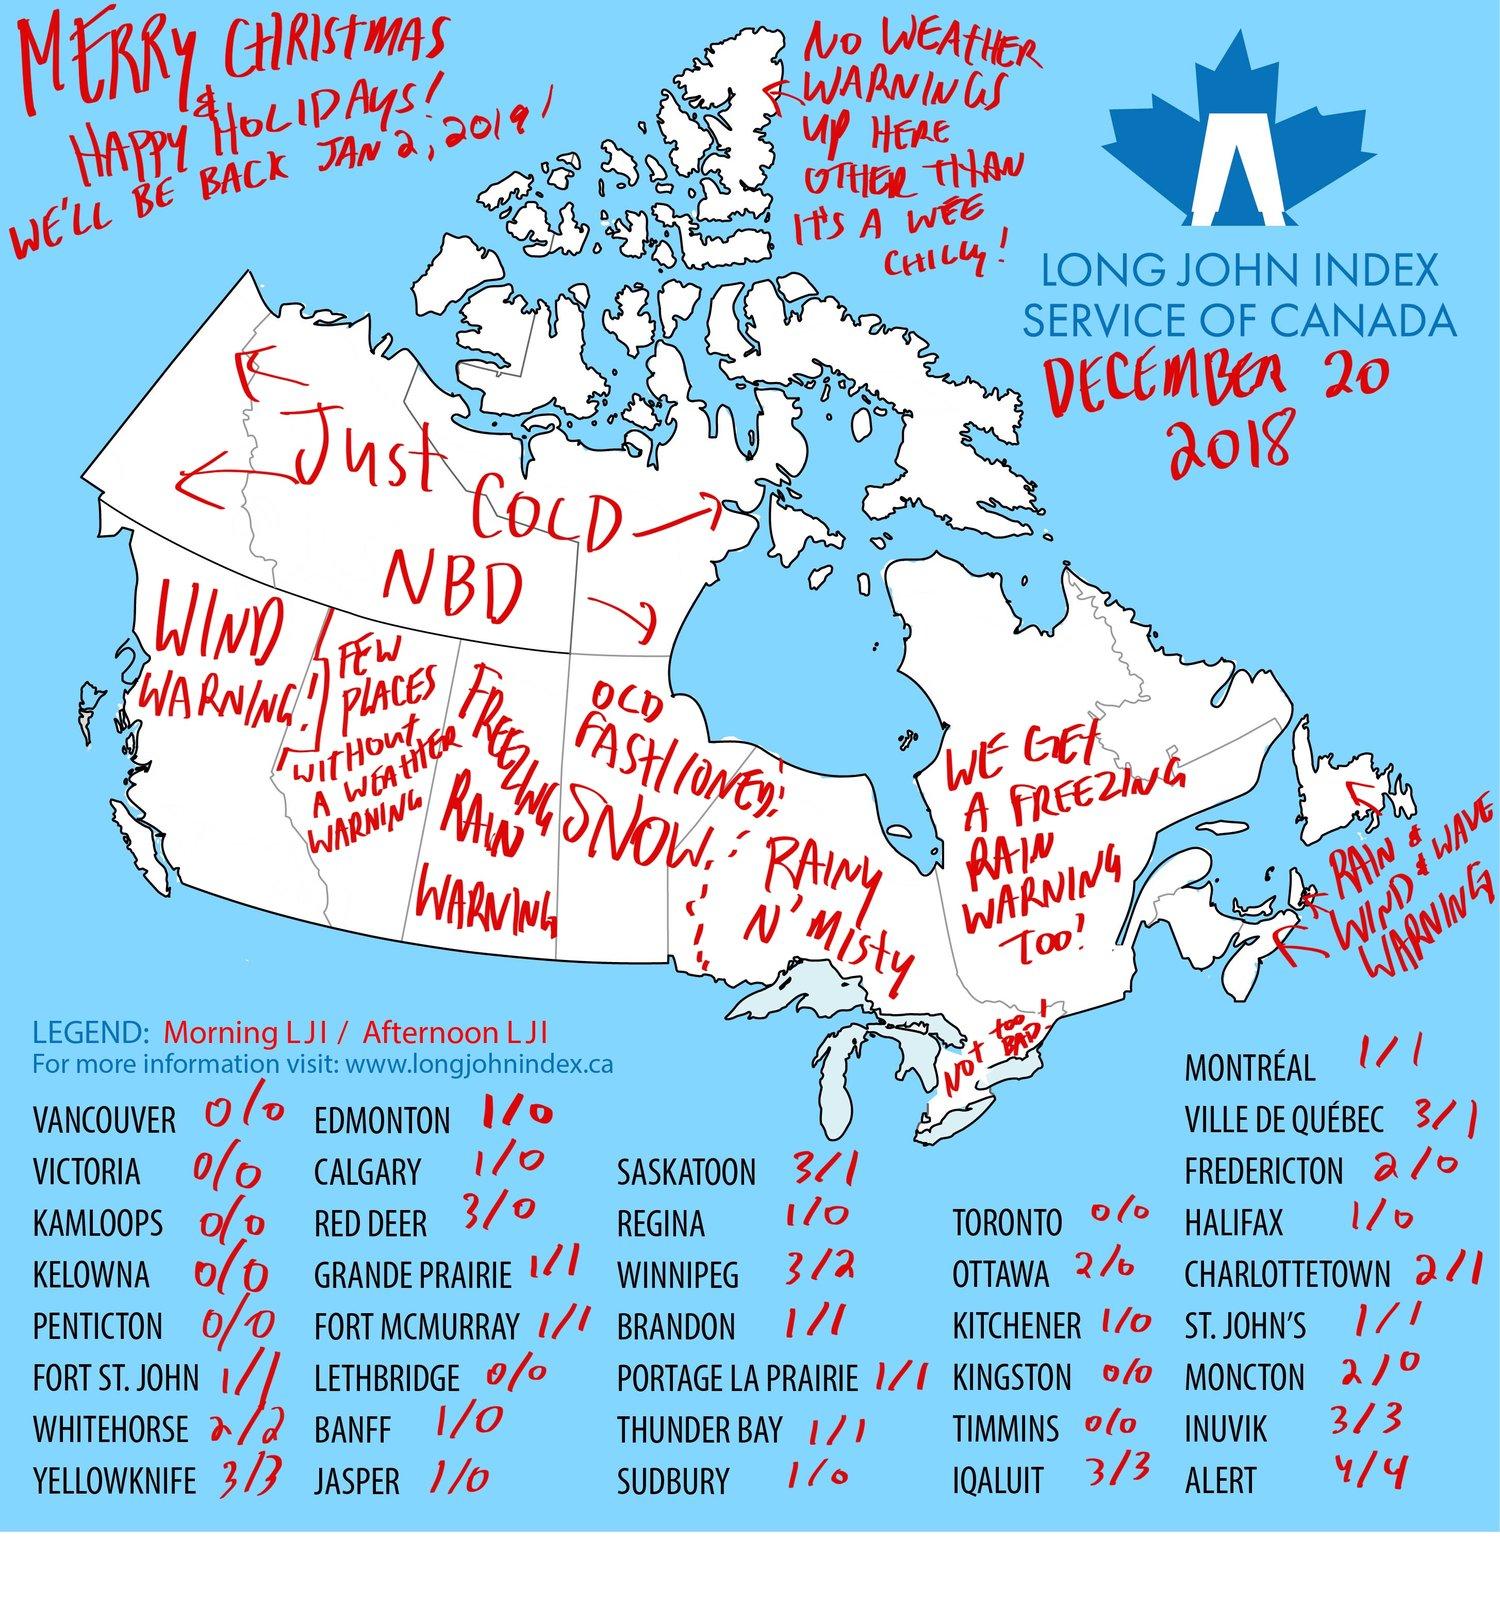 Long John Index Weather Map For December 20 2018 The Long John